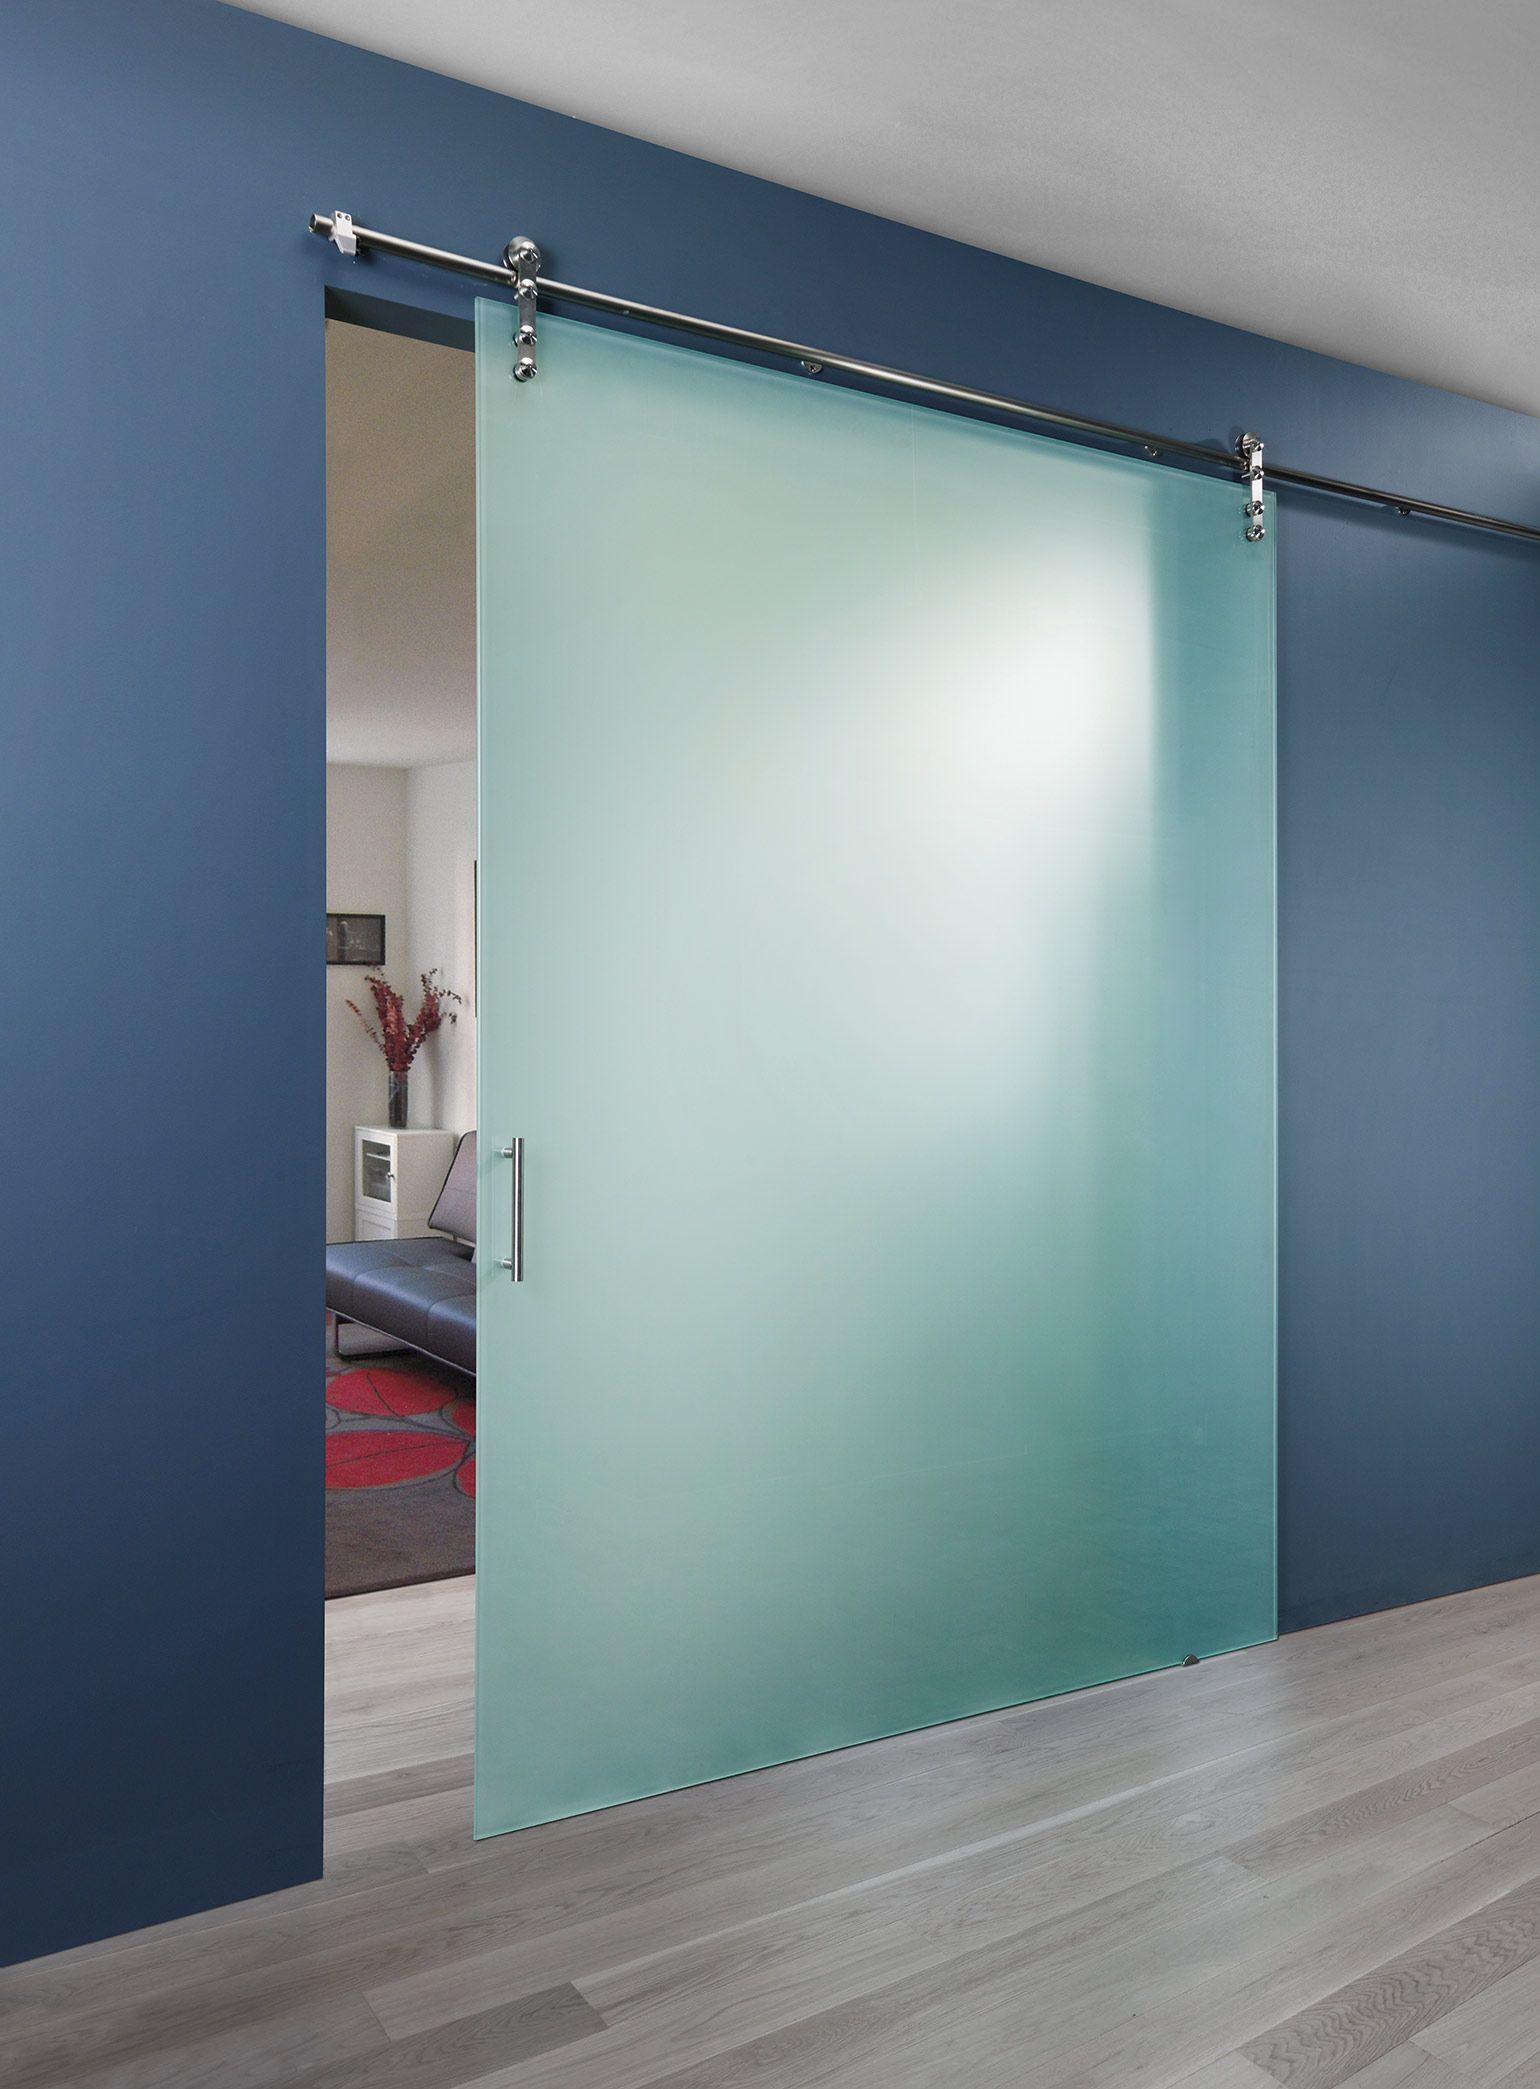 Waiting Room Sliding Glass Barn Door Inspirational Gallery Glass